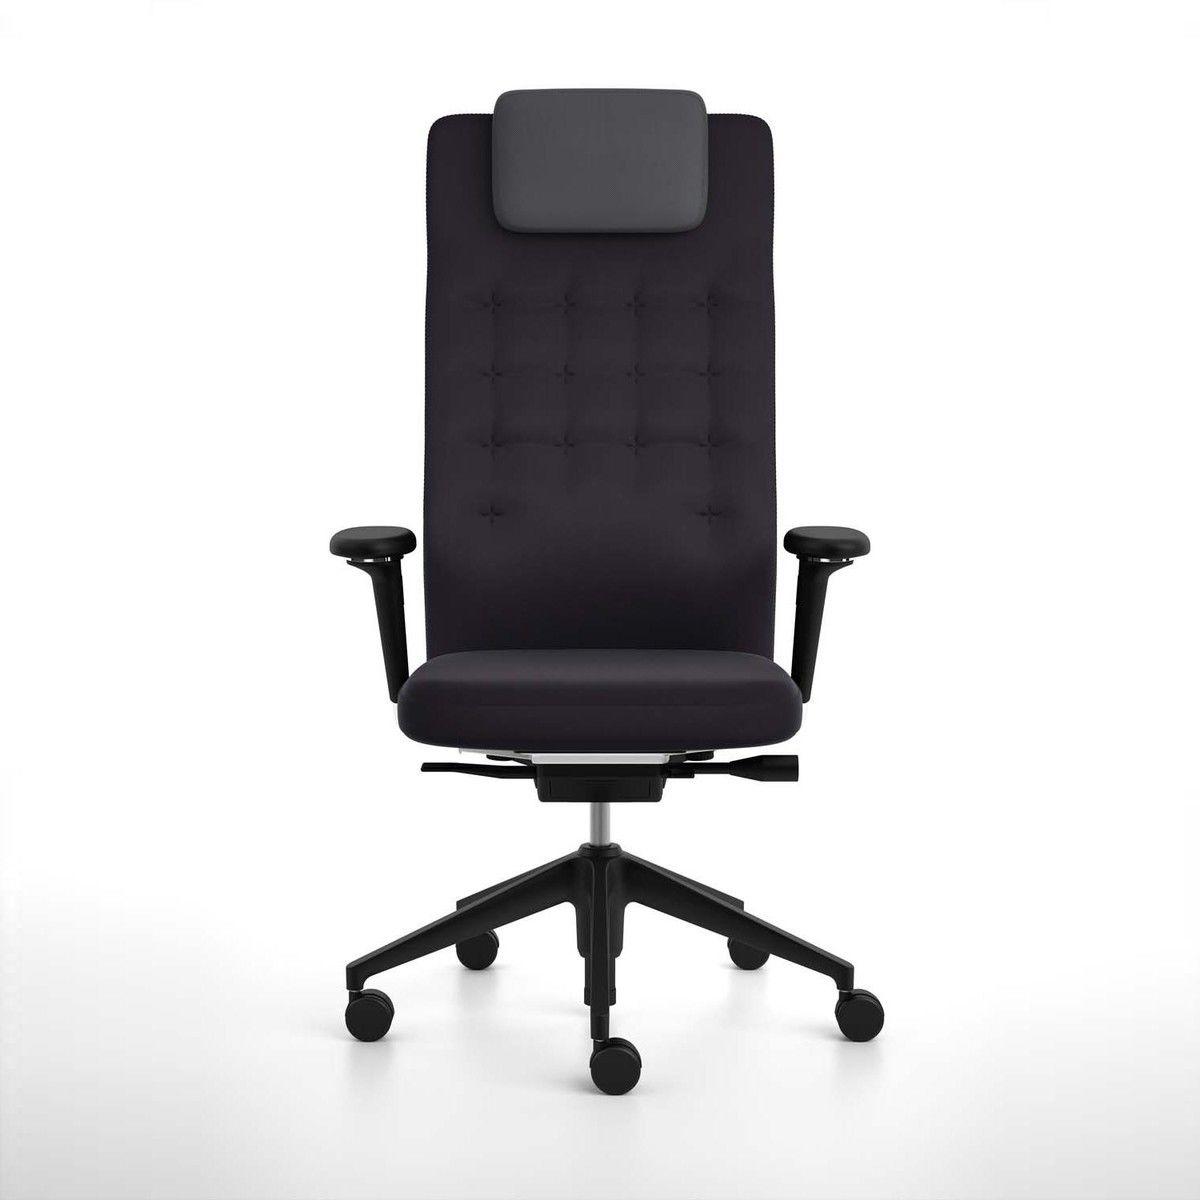 id trim l citterio office chair 3d armrests vitra. Black Bedroom Furniture Sets. Home Design Ideas